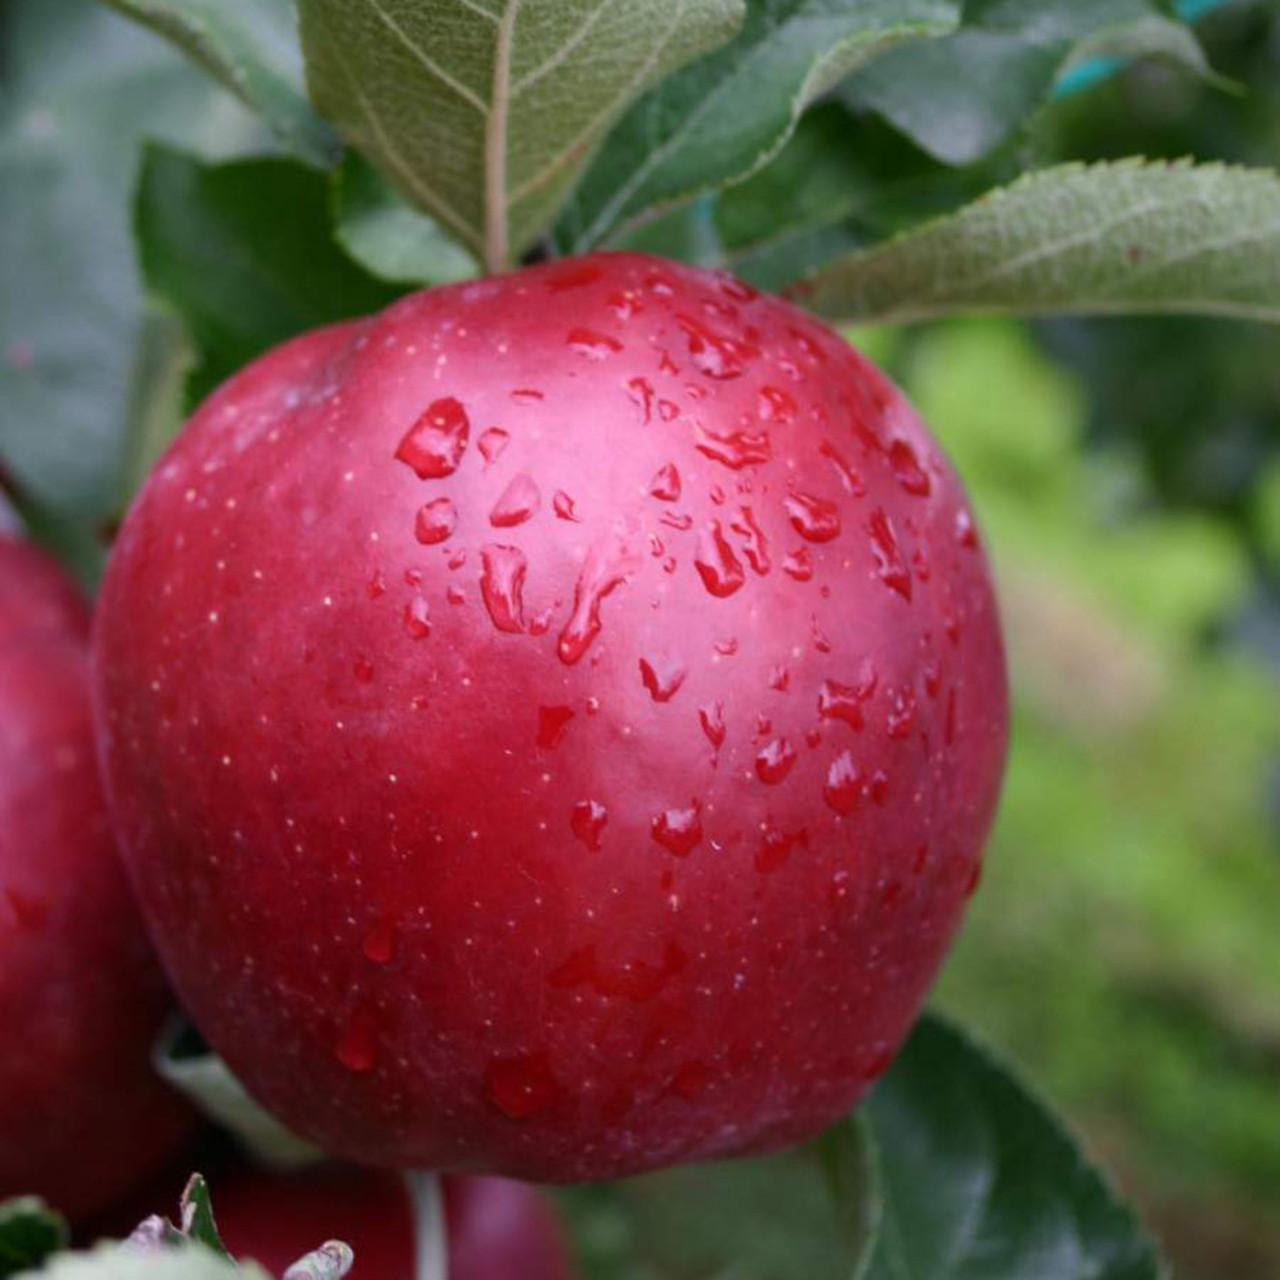 New на Україні! Саджанці яблуні Гала Шніга Шніко Ред (Gala Shnіga Shnіko Red)